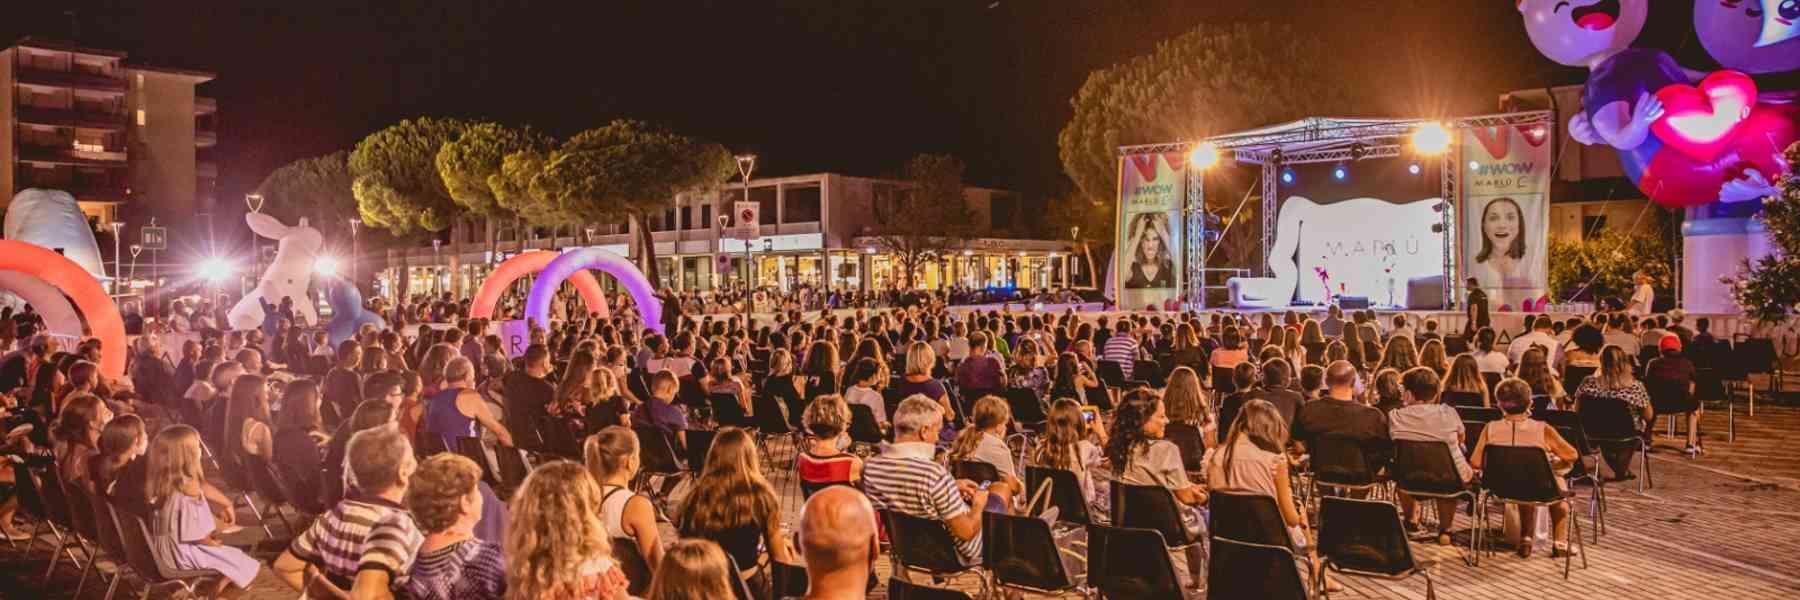 Pinarella Summer Social Time e Be-Viral